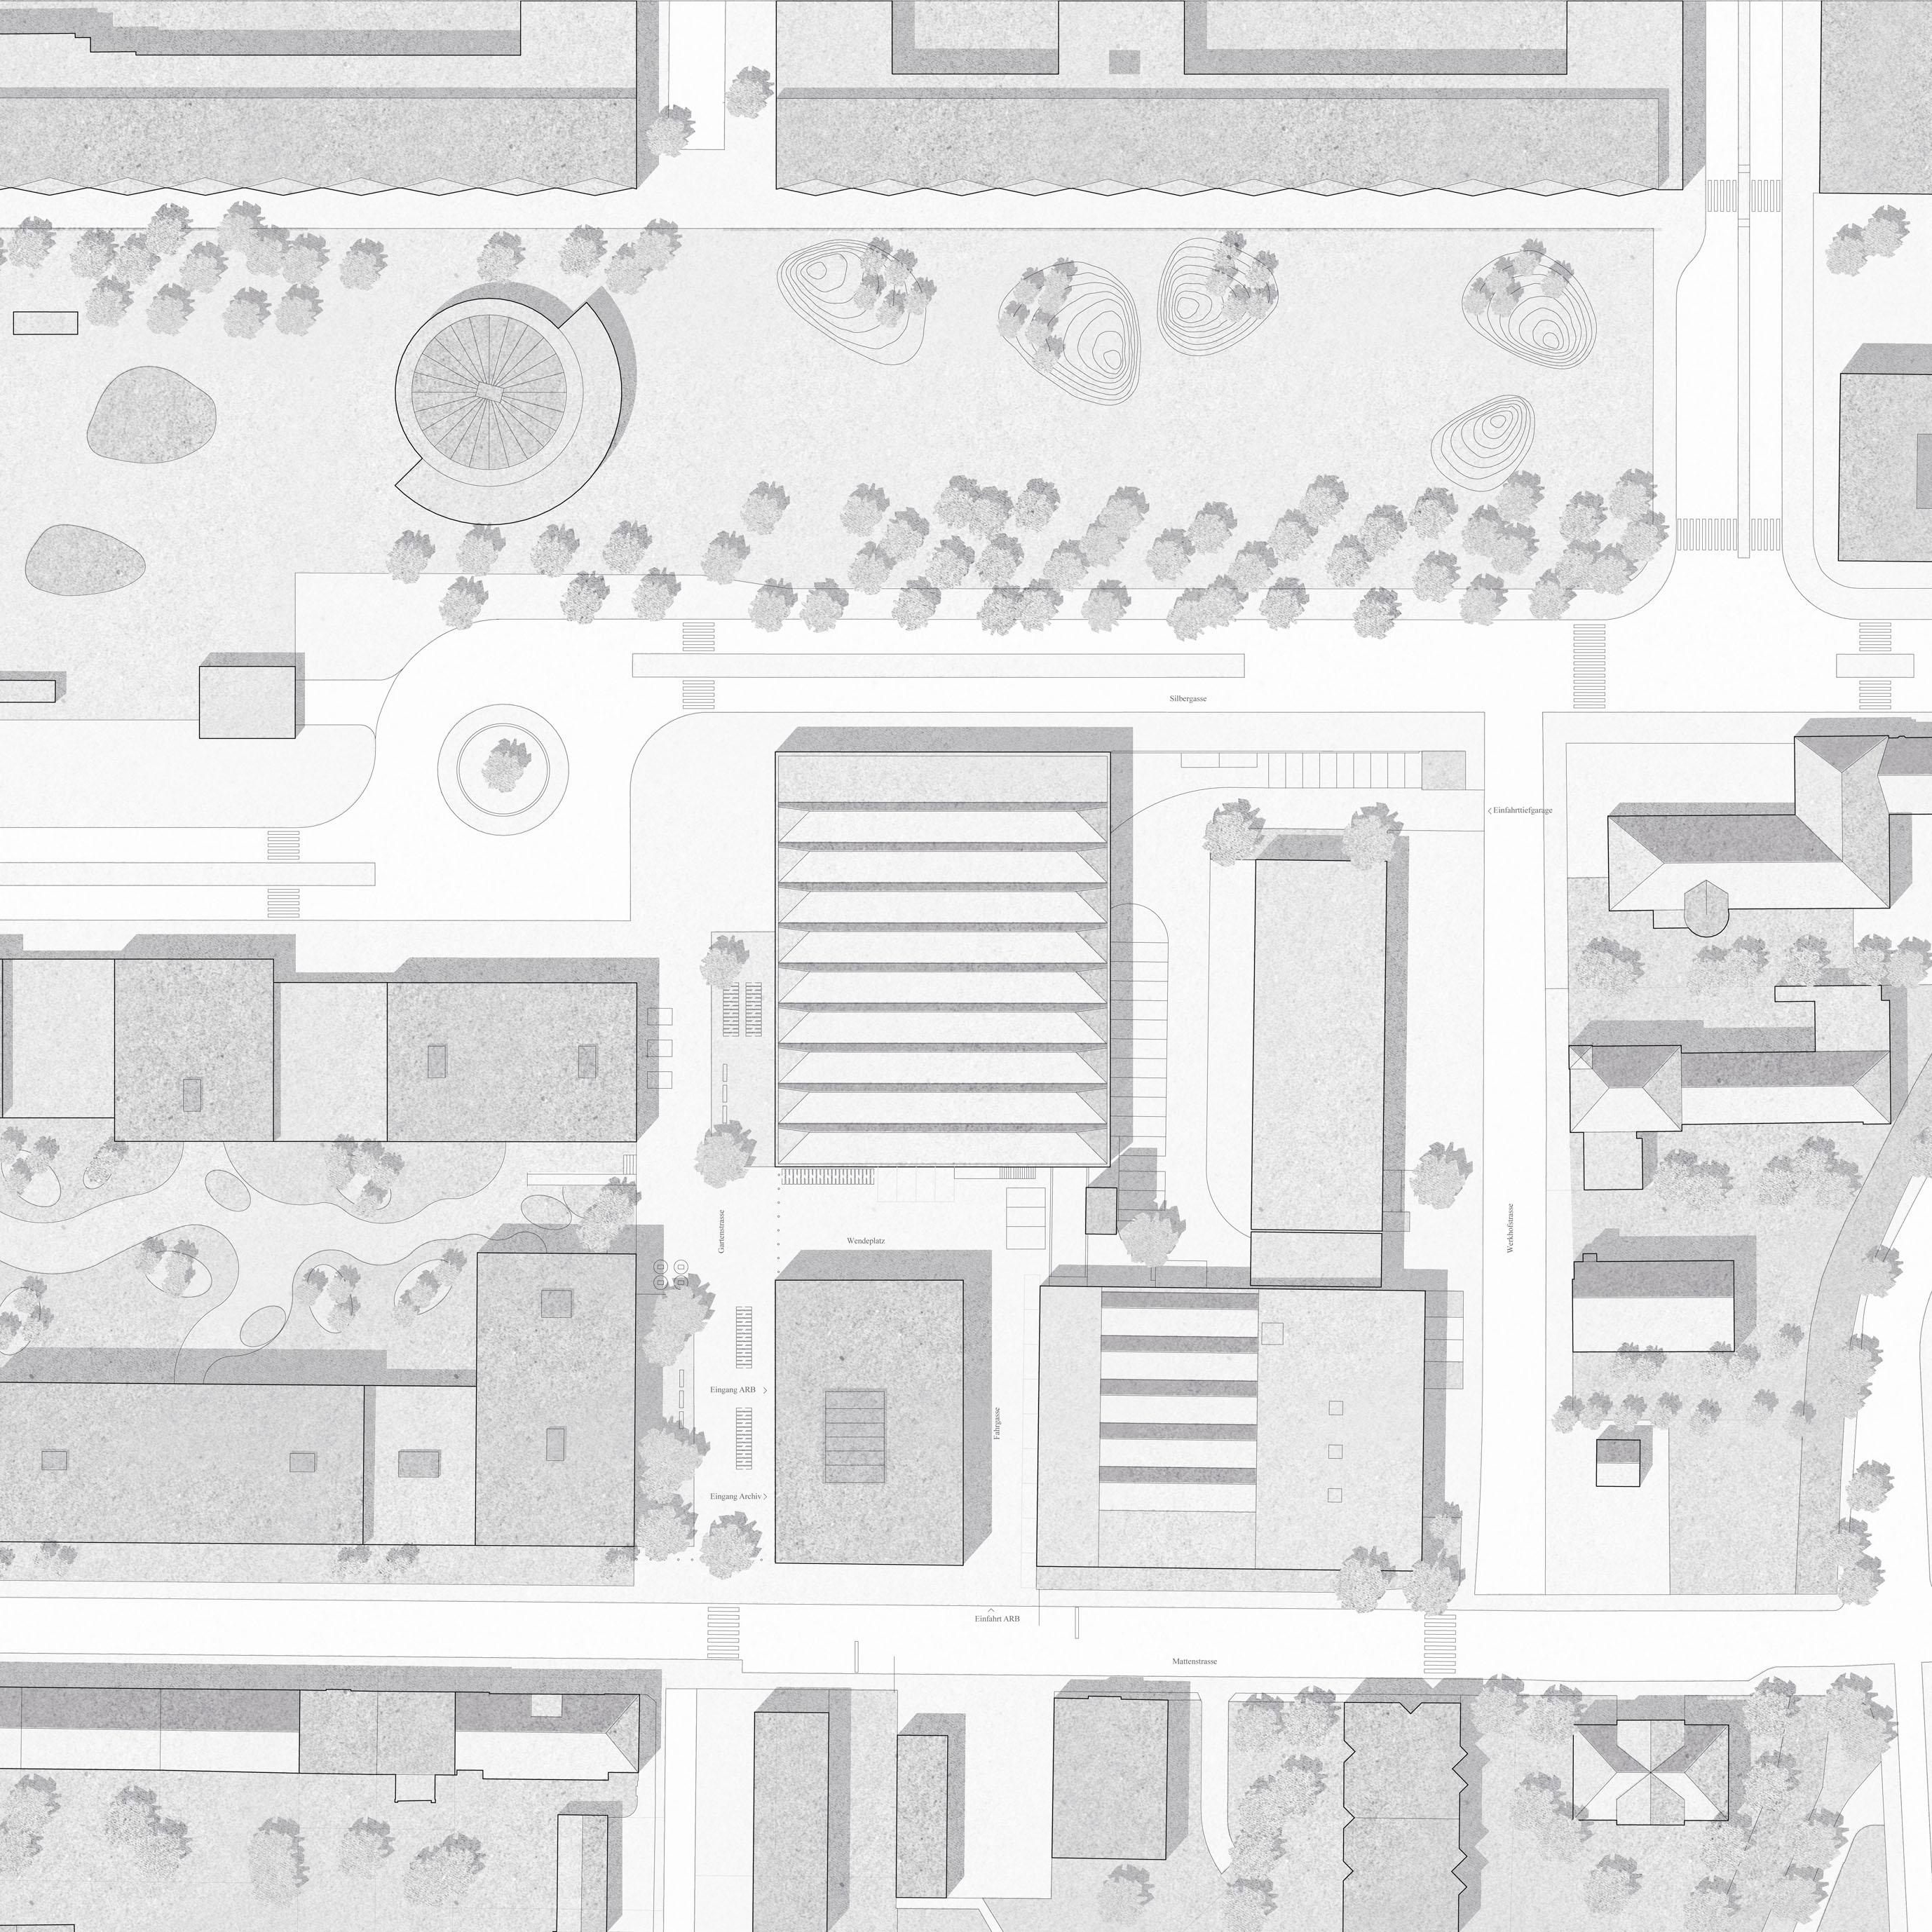 Neubau Bieler Stadtarchiv und Ambulanzgarage Region Biel Situation STUDIO CORNEL STAEHELI